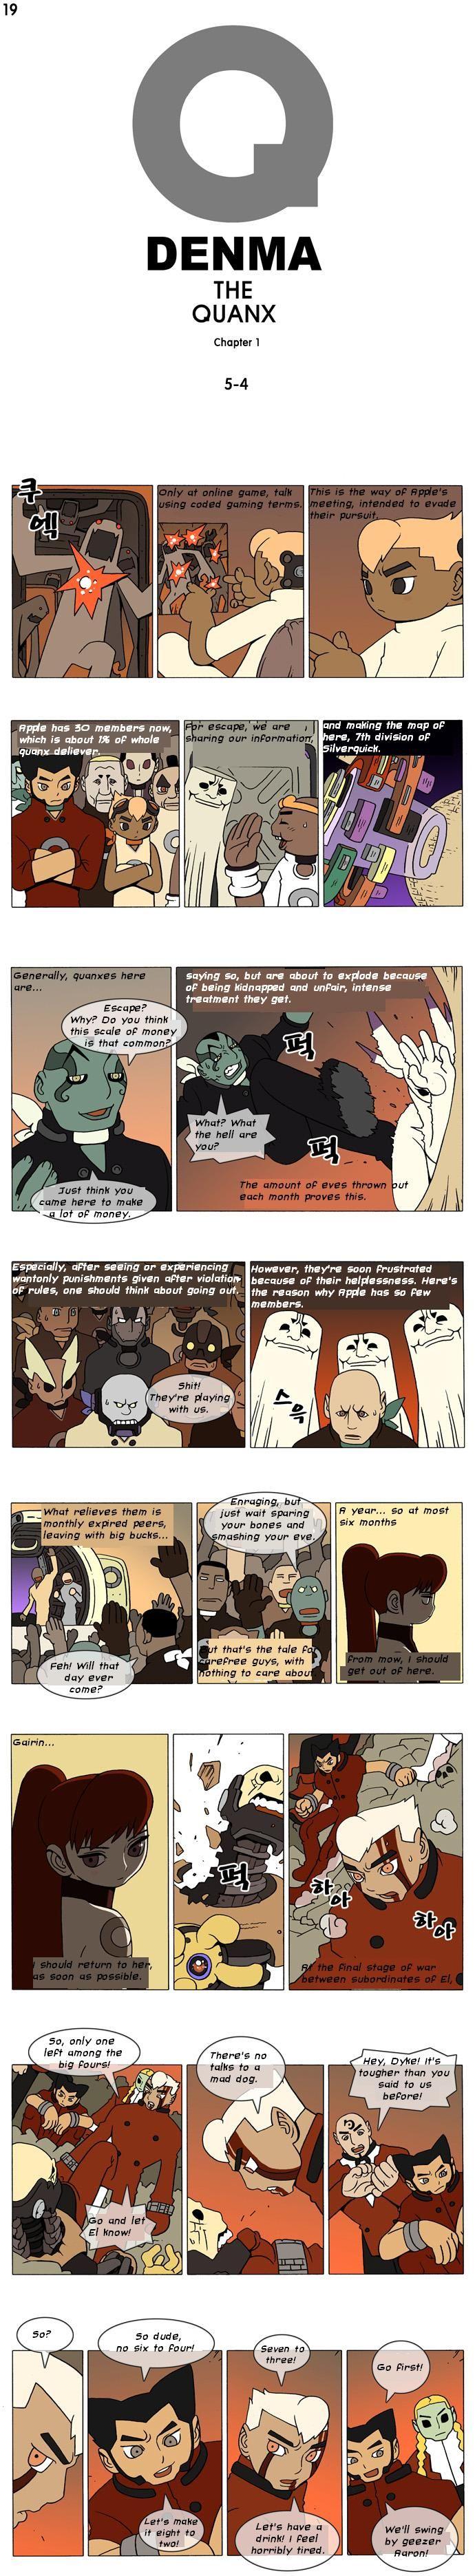 Denma 19 Page 1